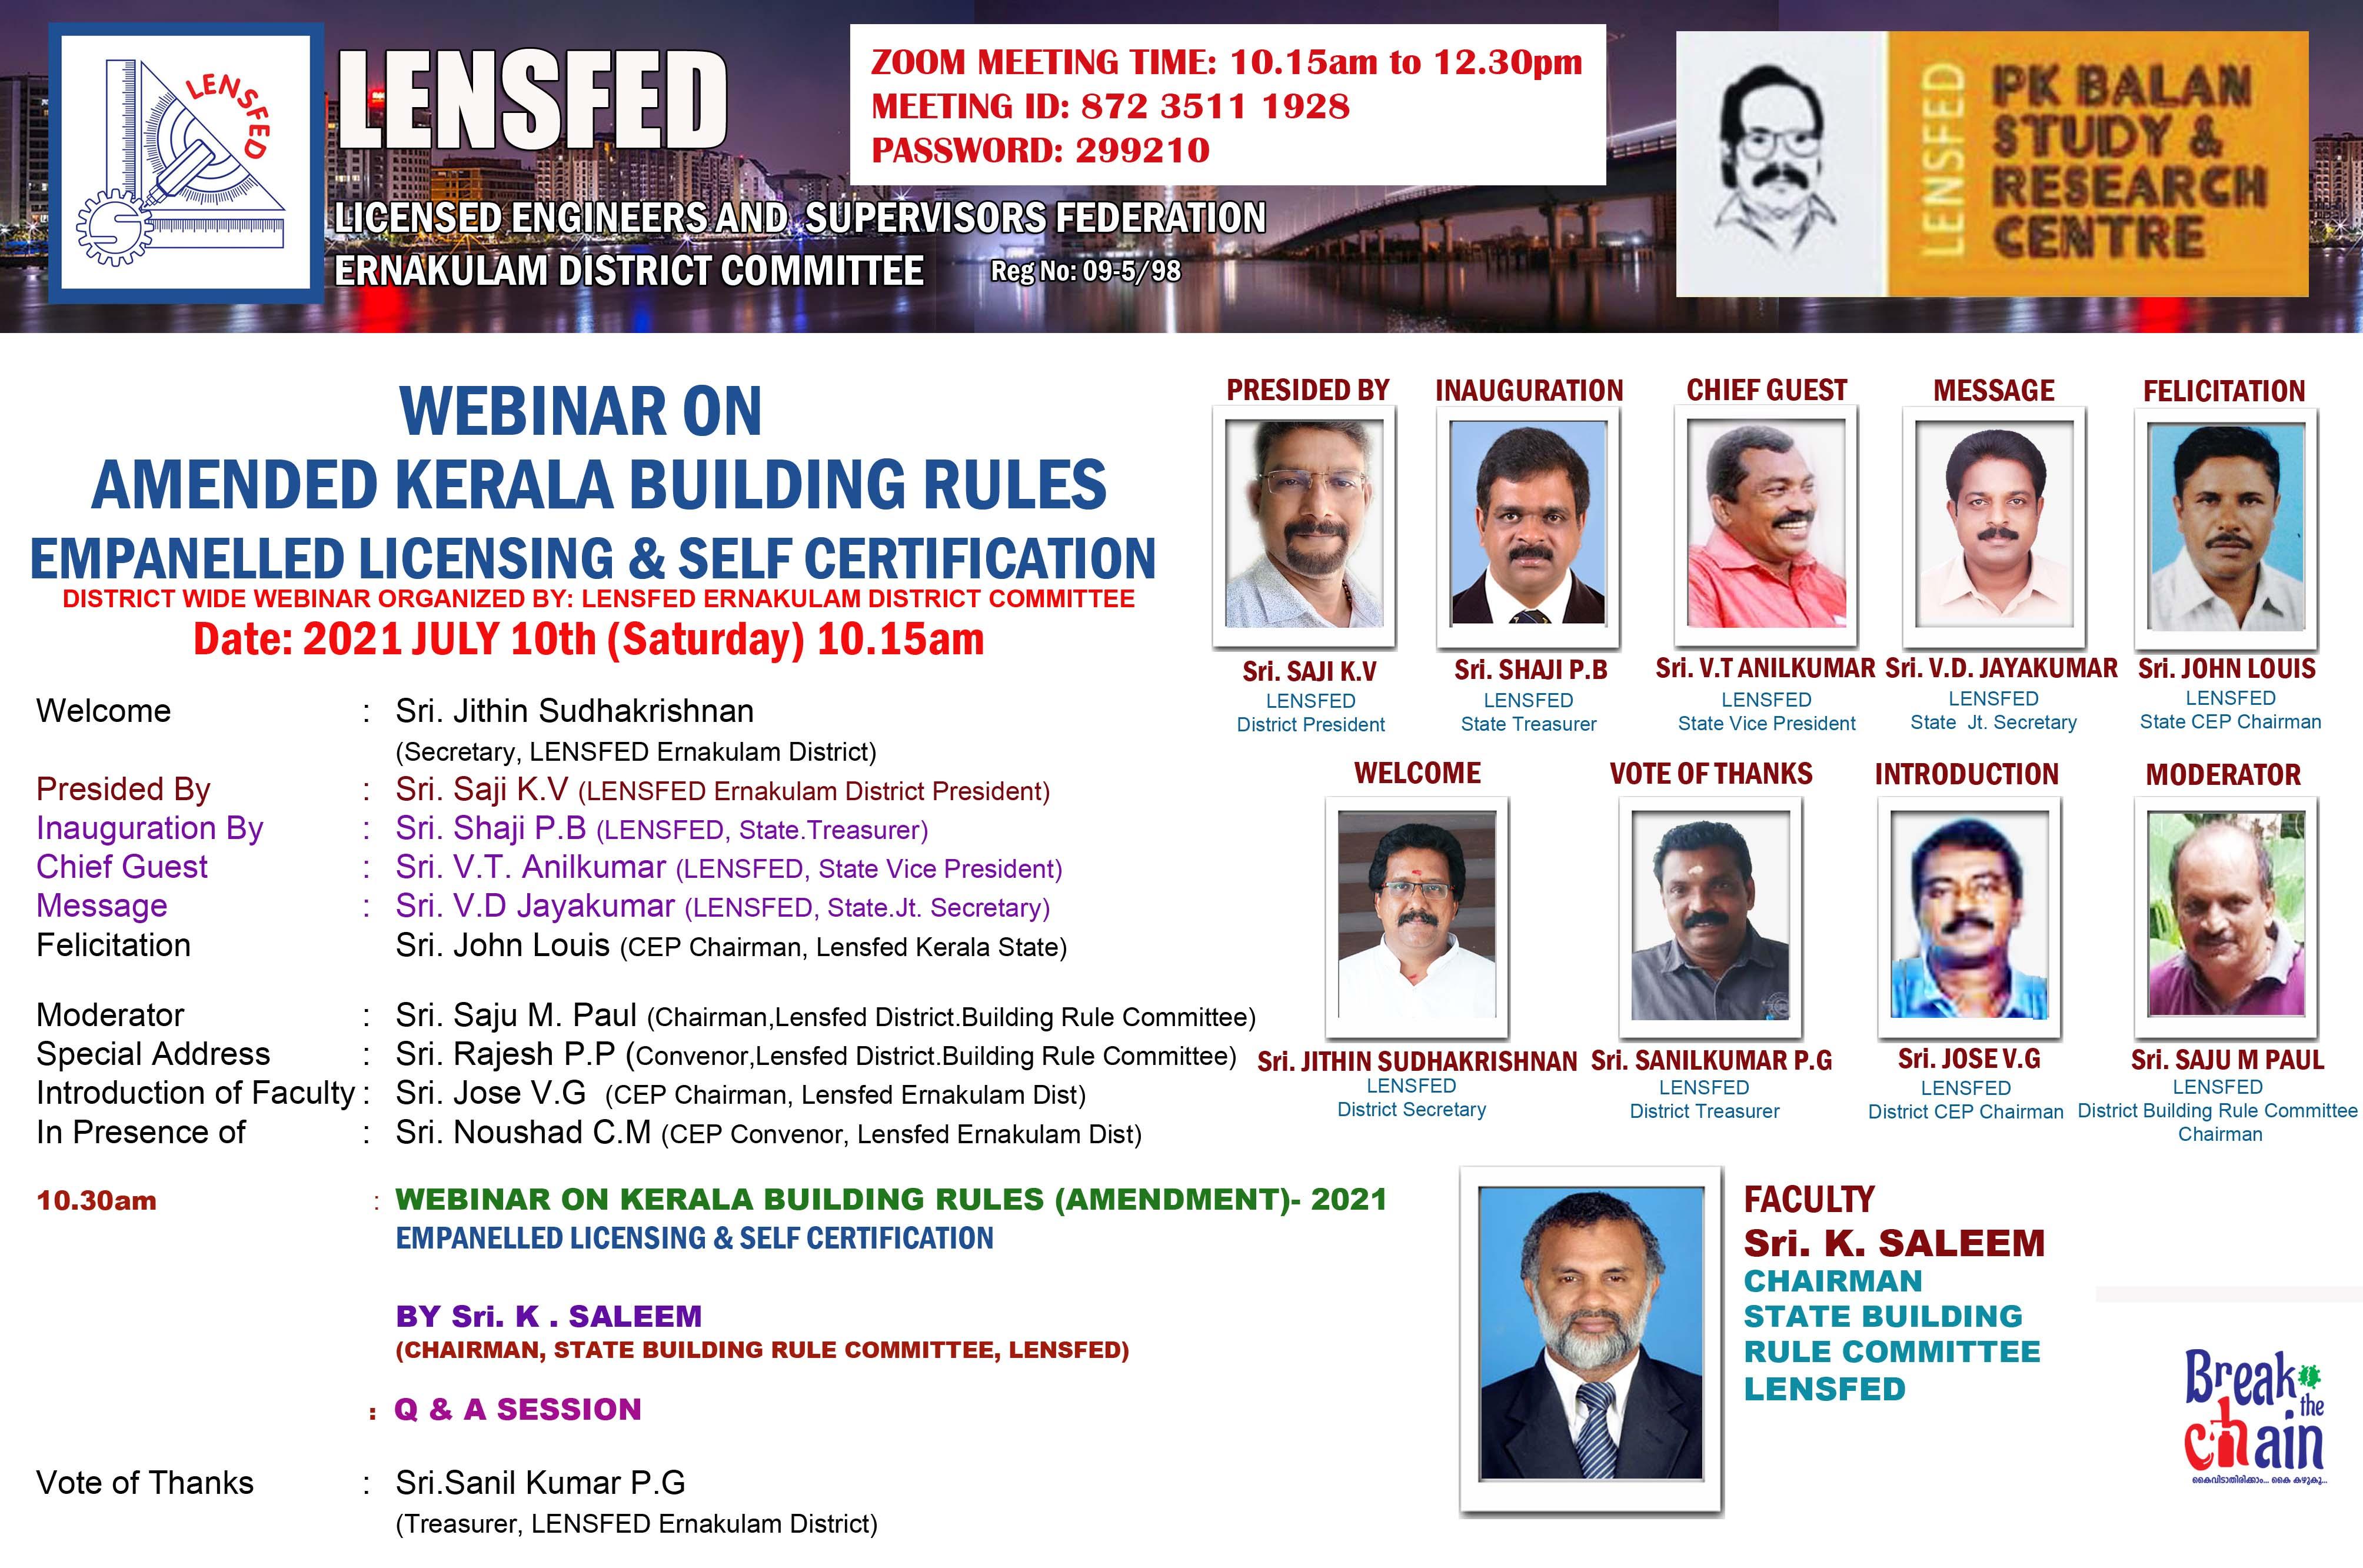 KERALA BUILDING RULE AMENDMENT 2021: WEBINAR ON EMPANELLED LICENSING & SELF CERTIFICATION